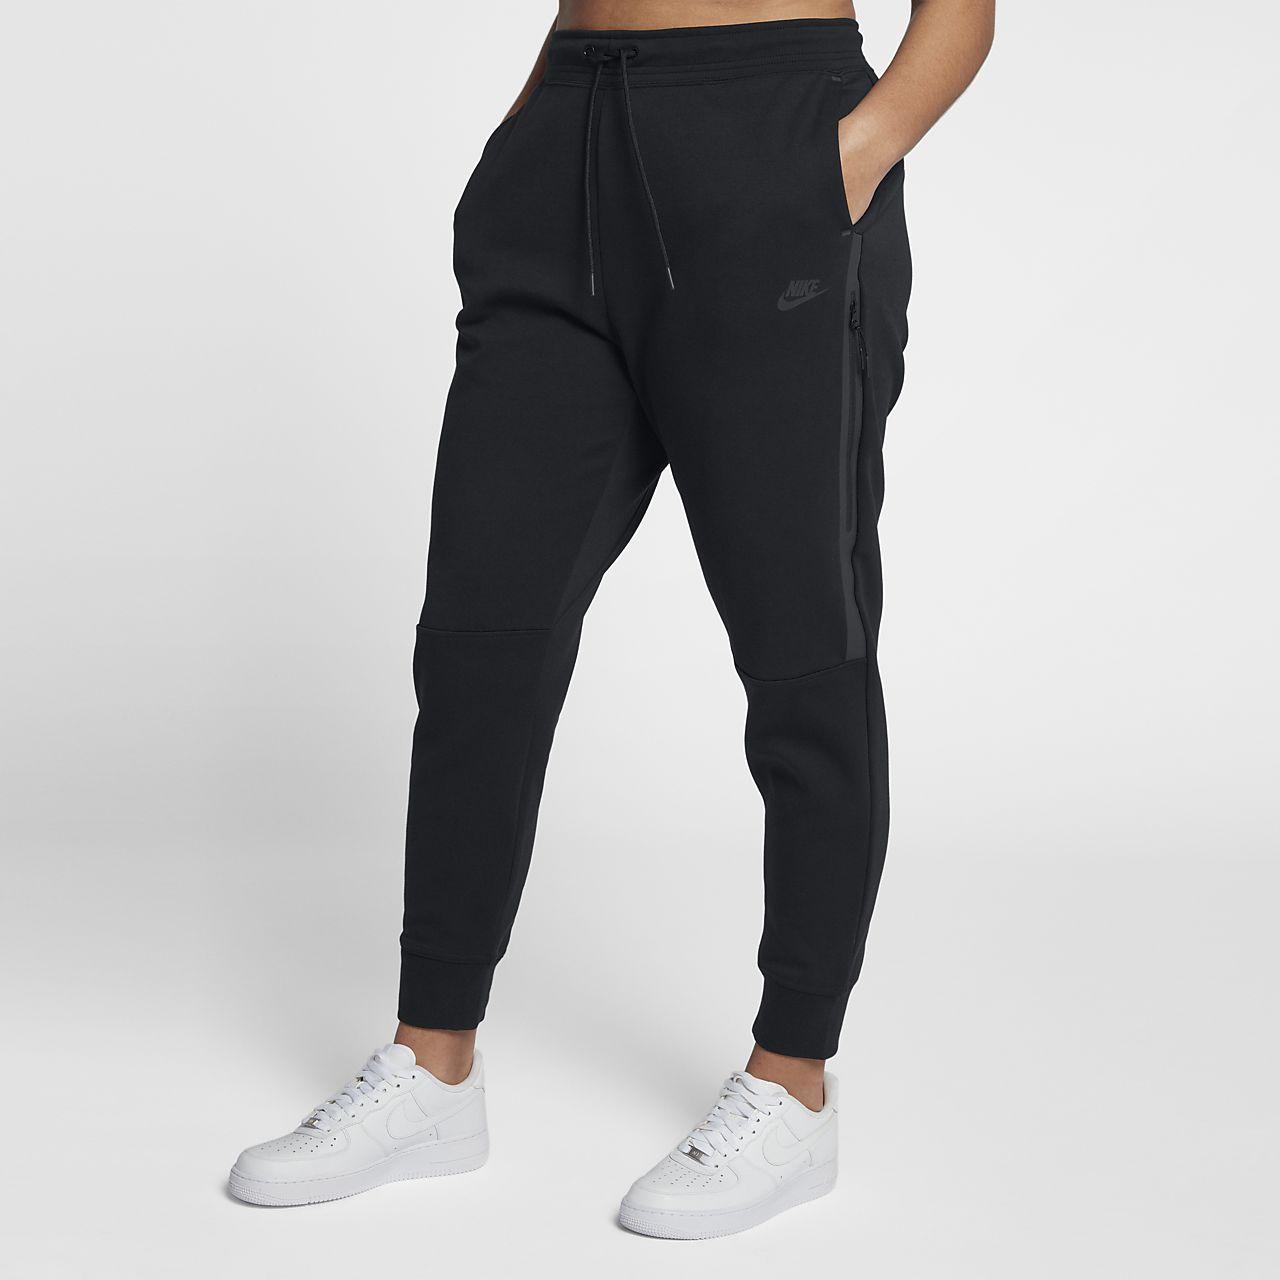 pantalones para mujer nike sportswear tech fleece mx. Black Bedroom Furniture Sets. Home Design Ideas